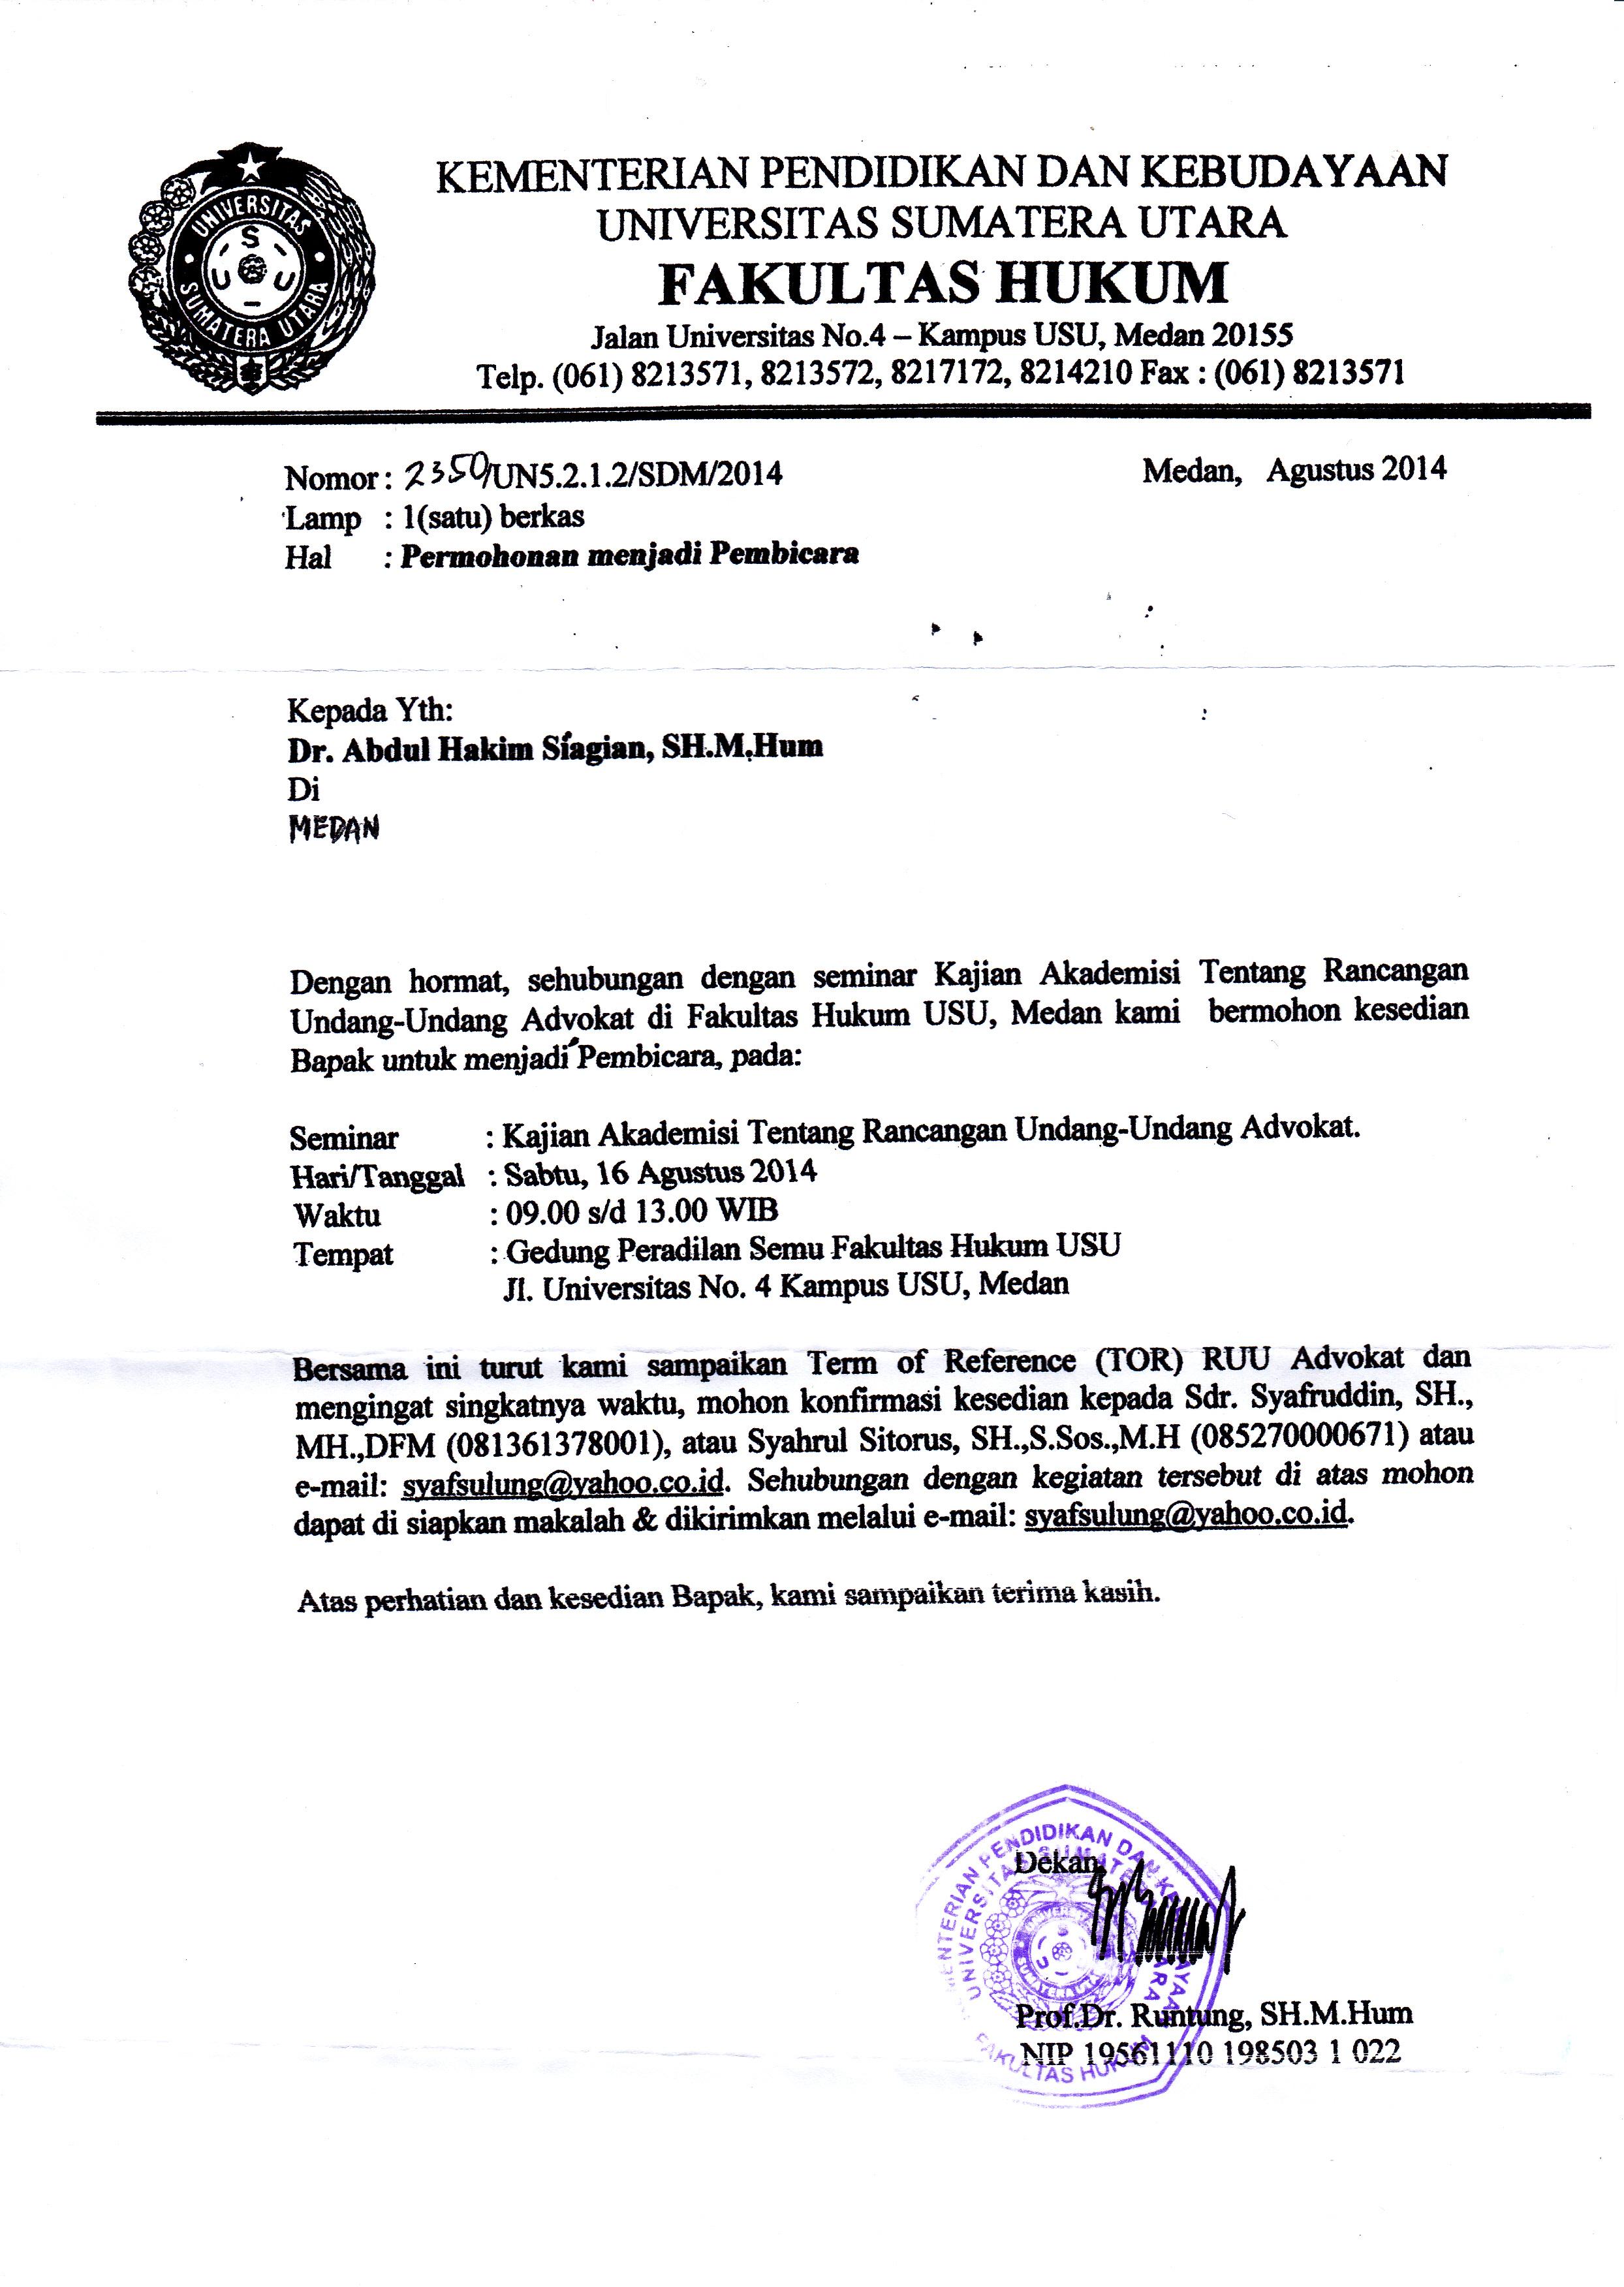 Contoh Undangan Workshop : contoh, undangan, workshop, Contoh, Surat, Undangan, Narasumber, Workshop